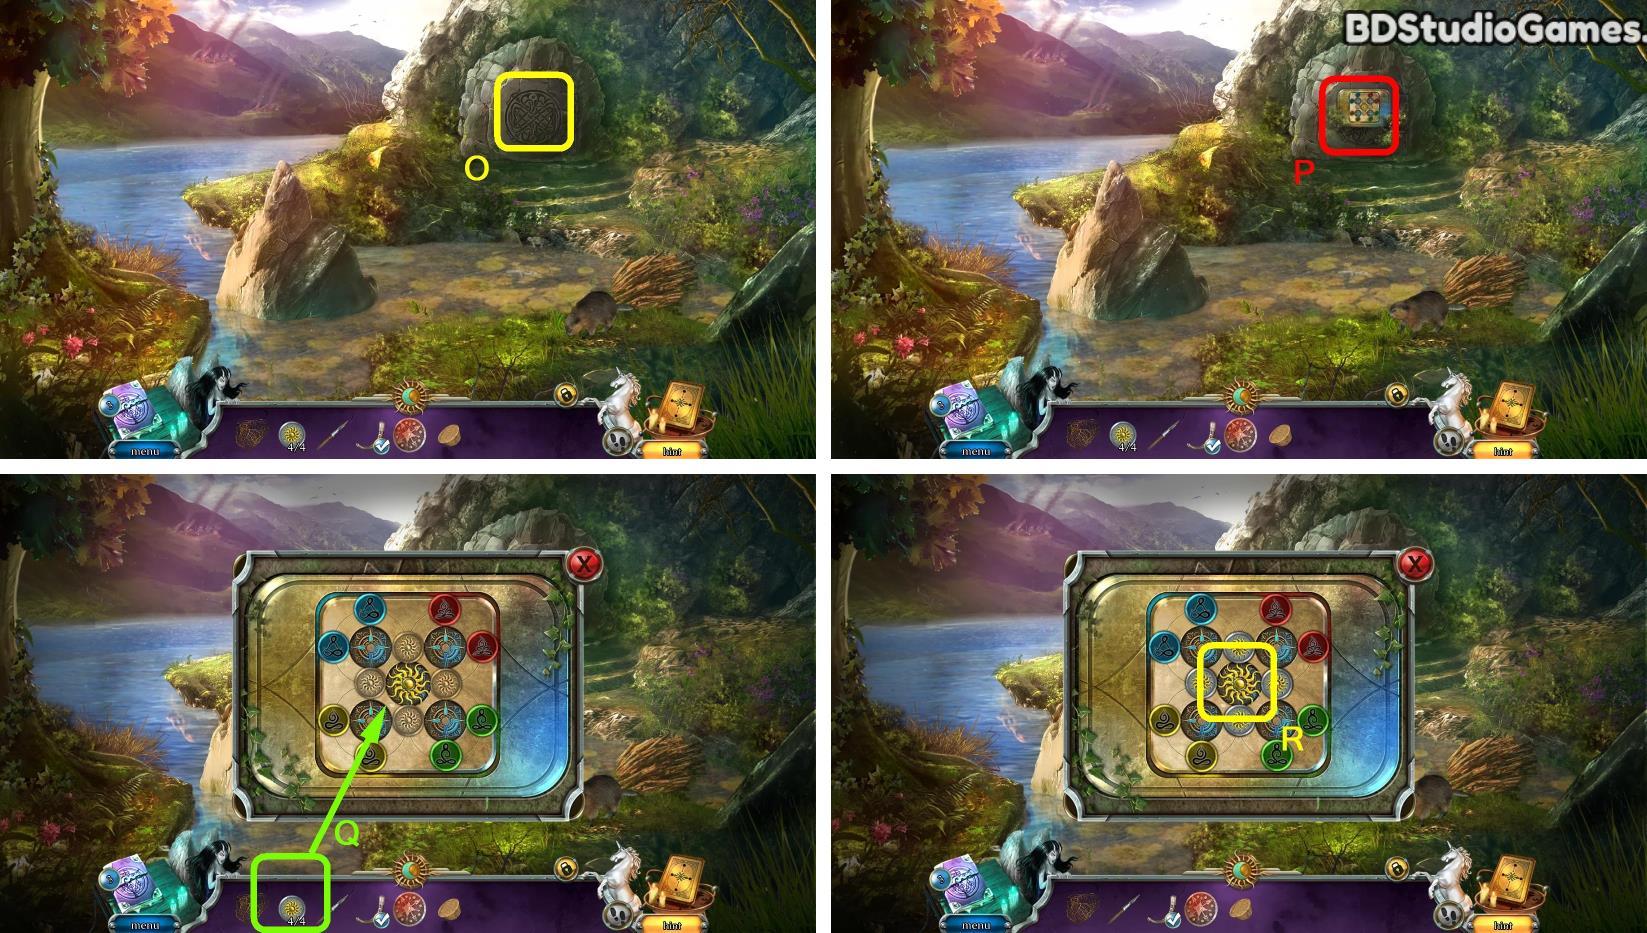 The Seven Chambers Walkthrough Screenshot 0014